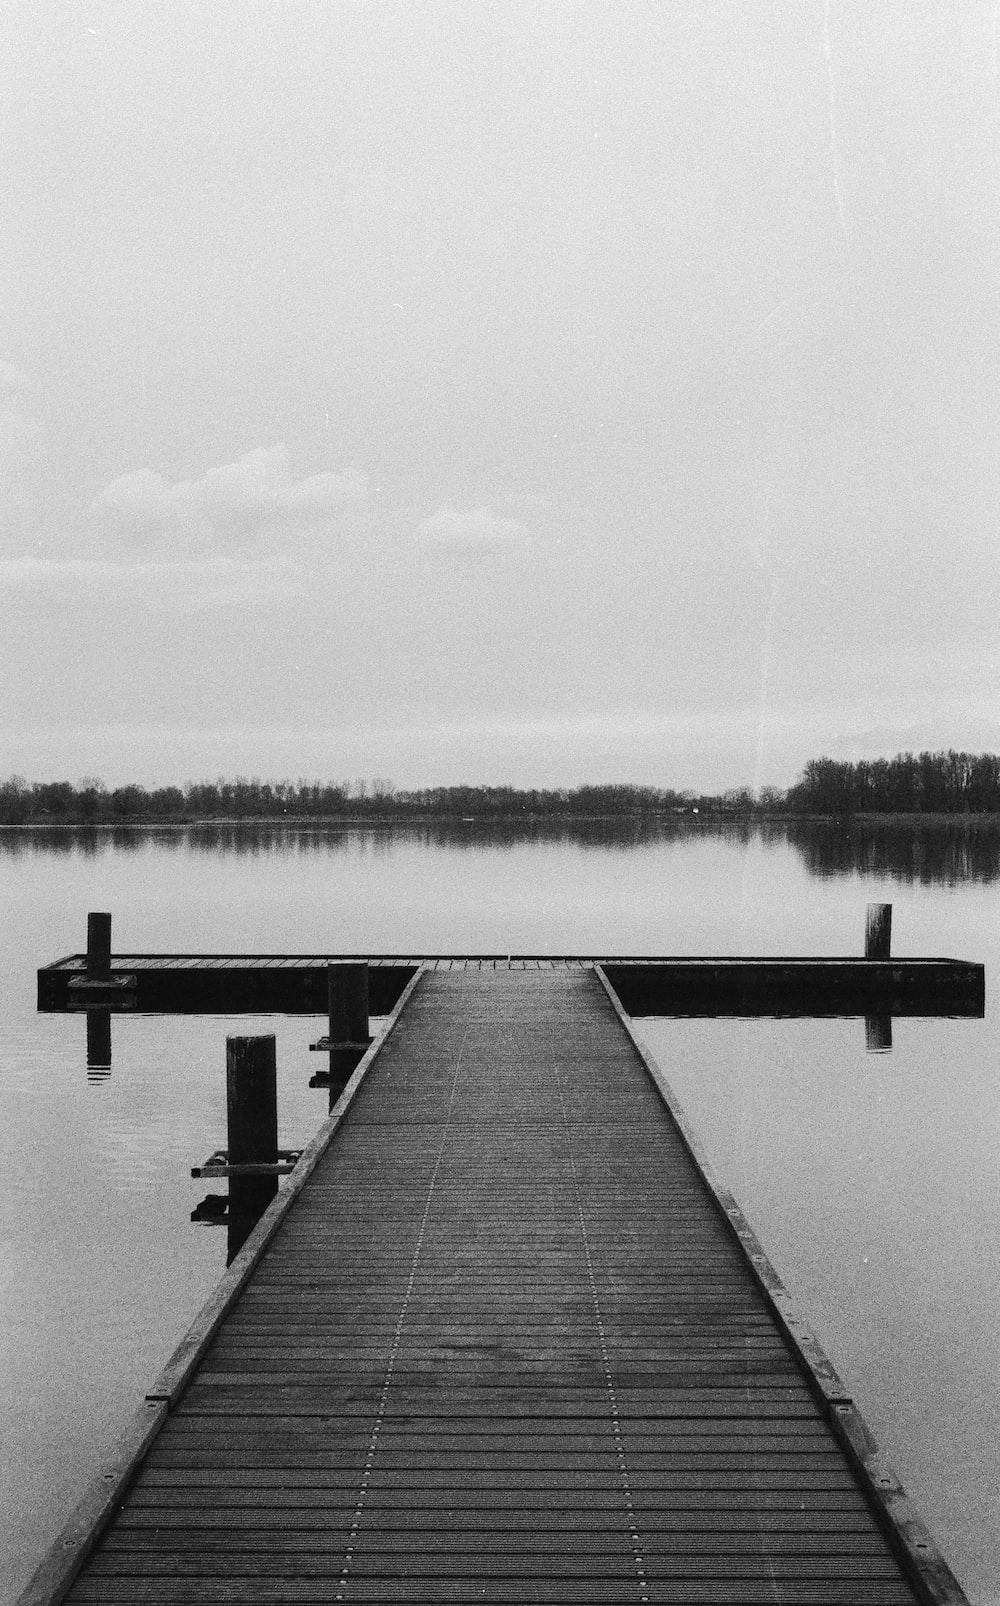 wooden dock on lake during daytime